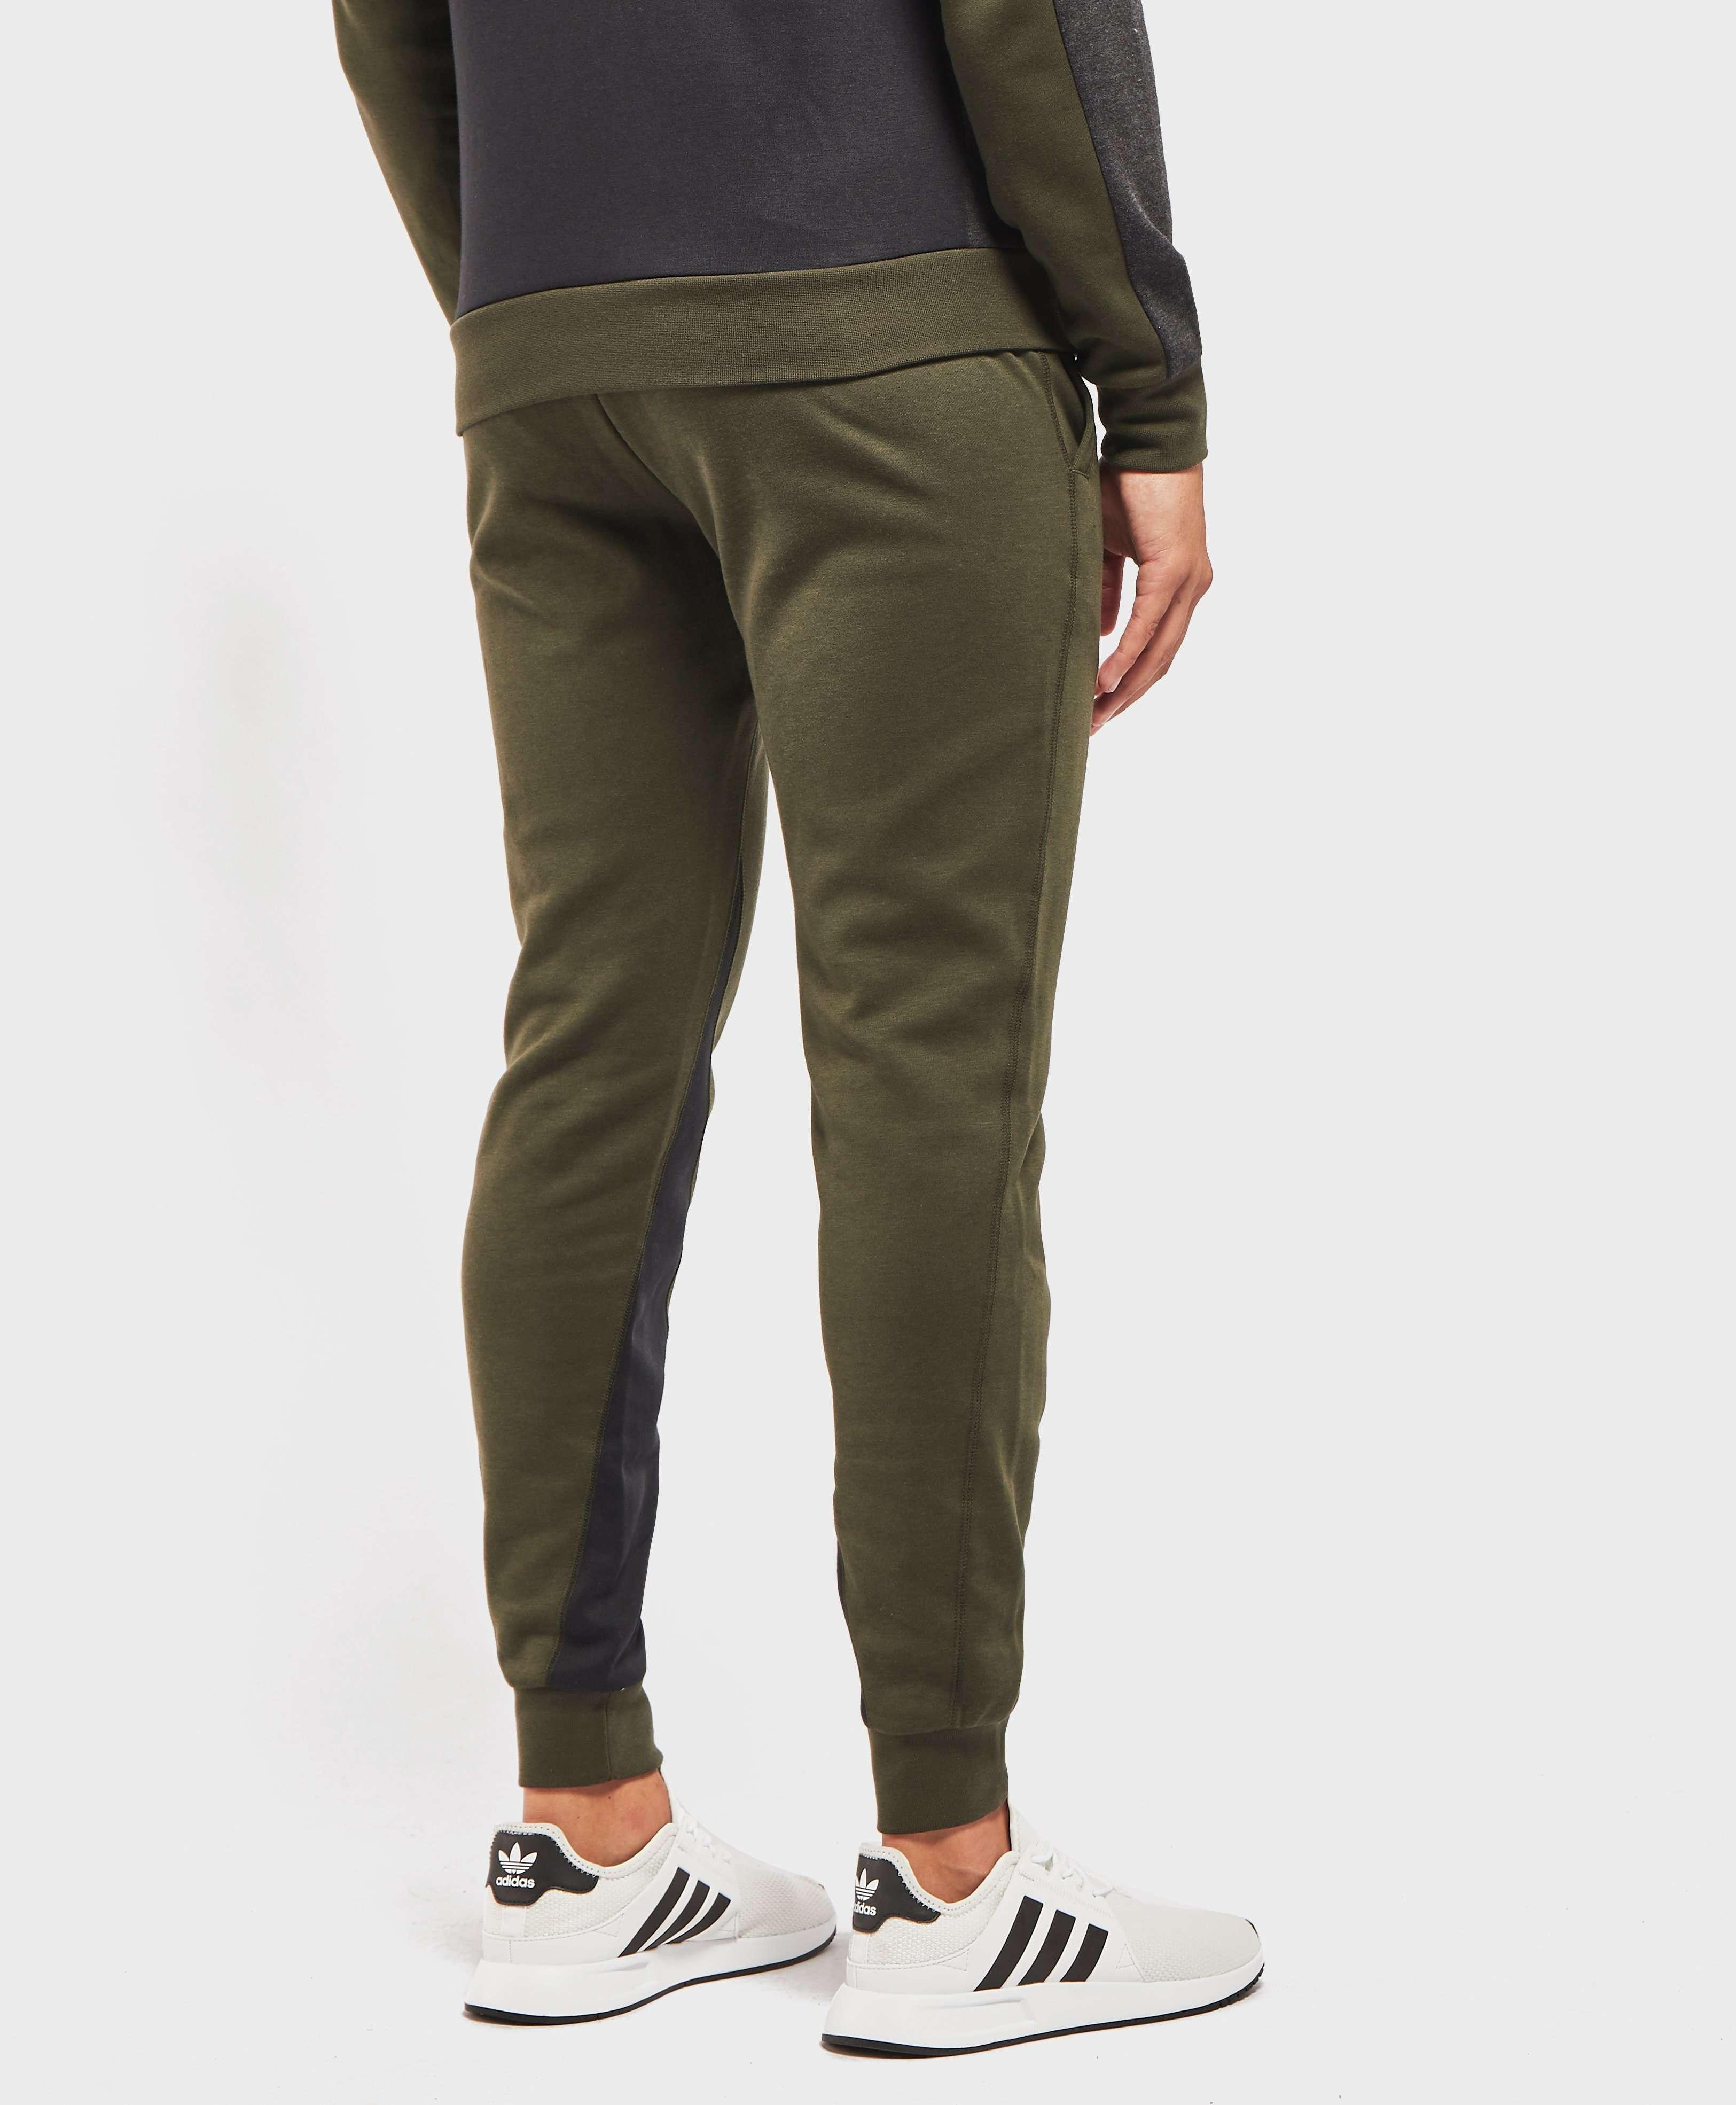 Emporio Armani EA7 Premium Cut and Sew Fleece Pants - Exclusive